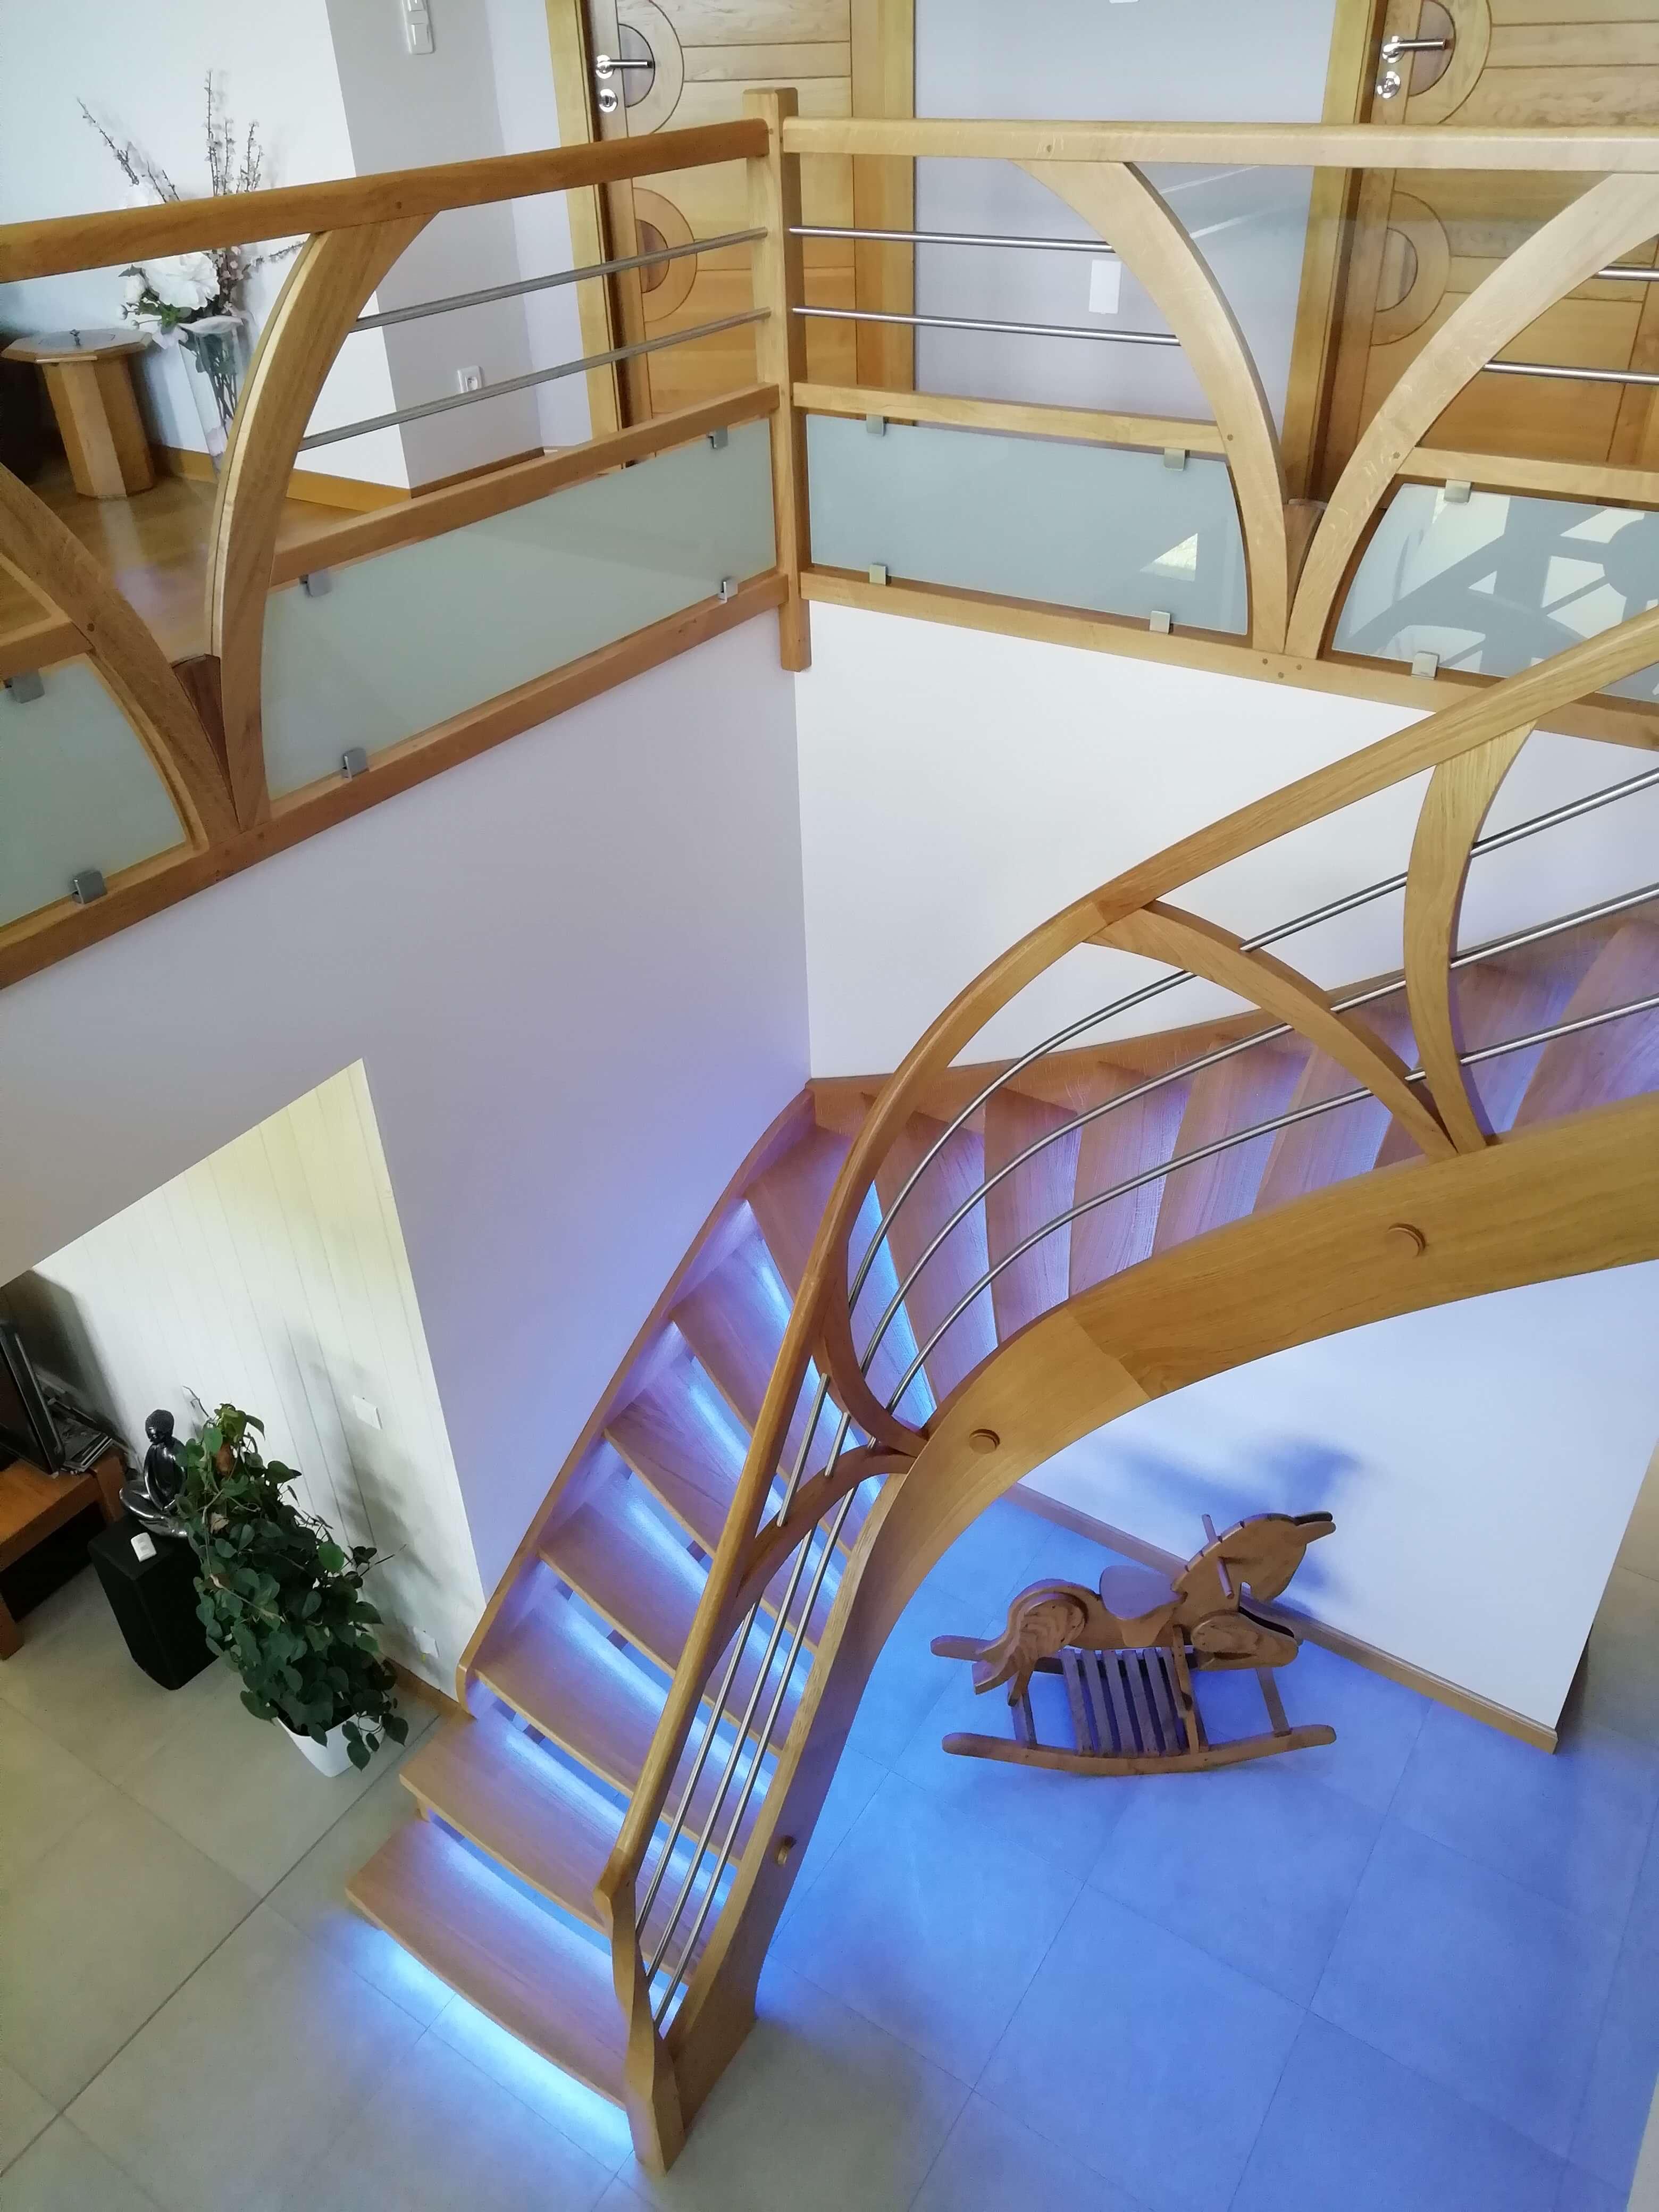 Menuiserie Figard - Fabrication sur mesure - Escalier courbe personnalisé - Chêne inox verre - Vesou